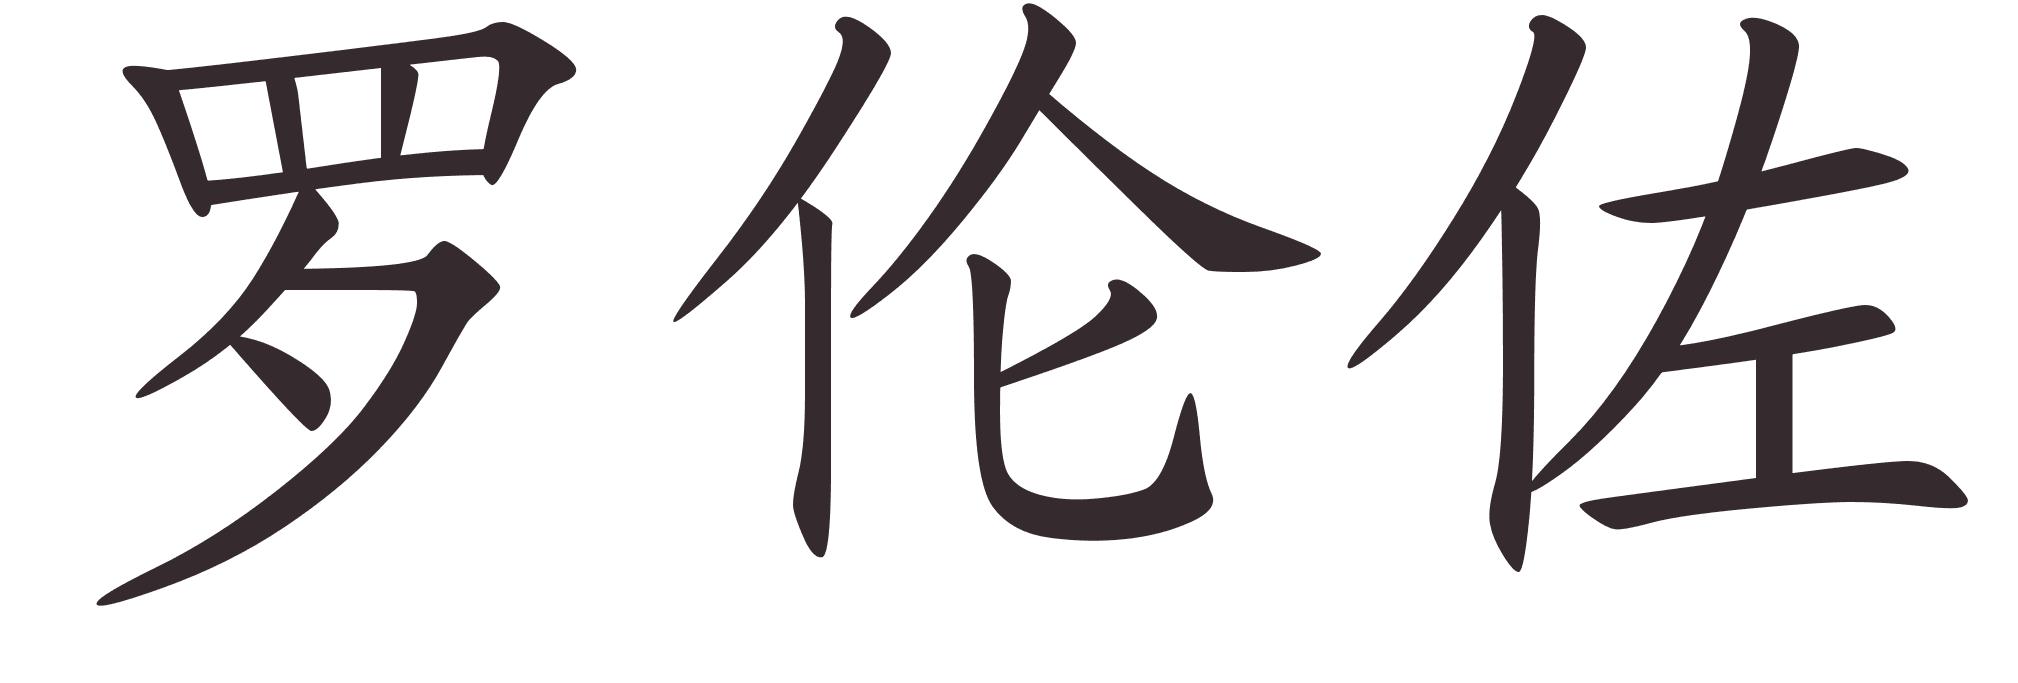 Prenom en ecriture chinoise - Lorenzo prenom ...